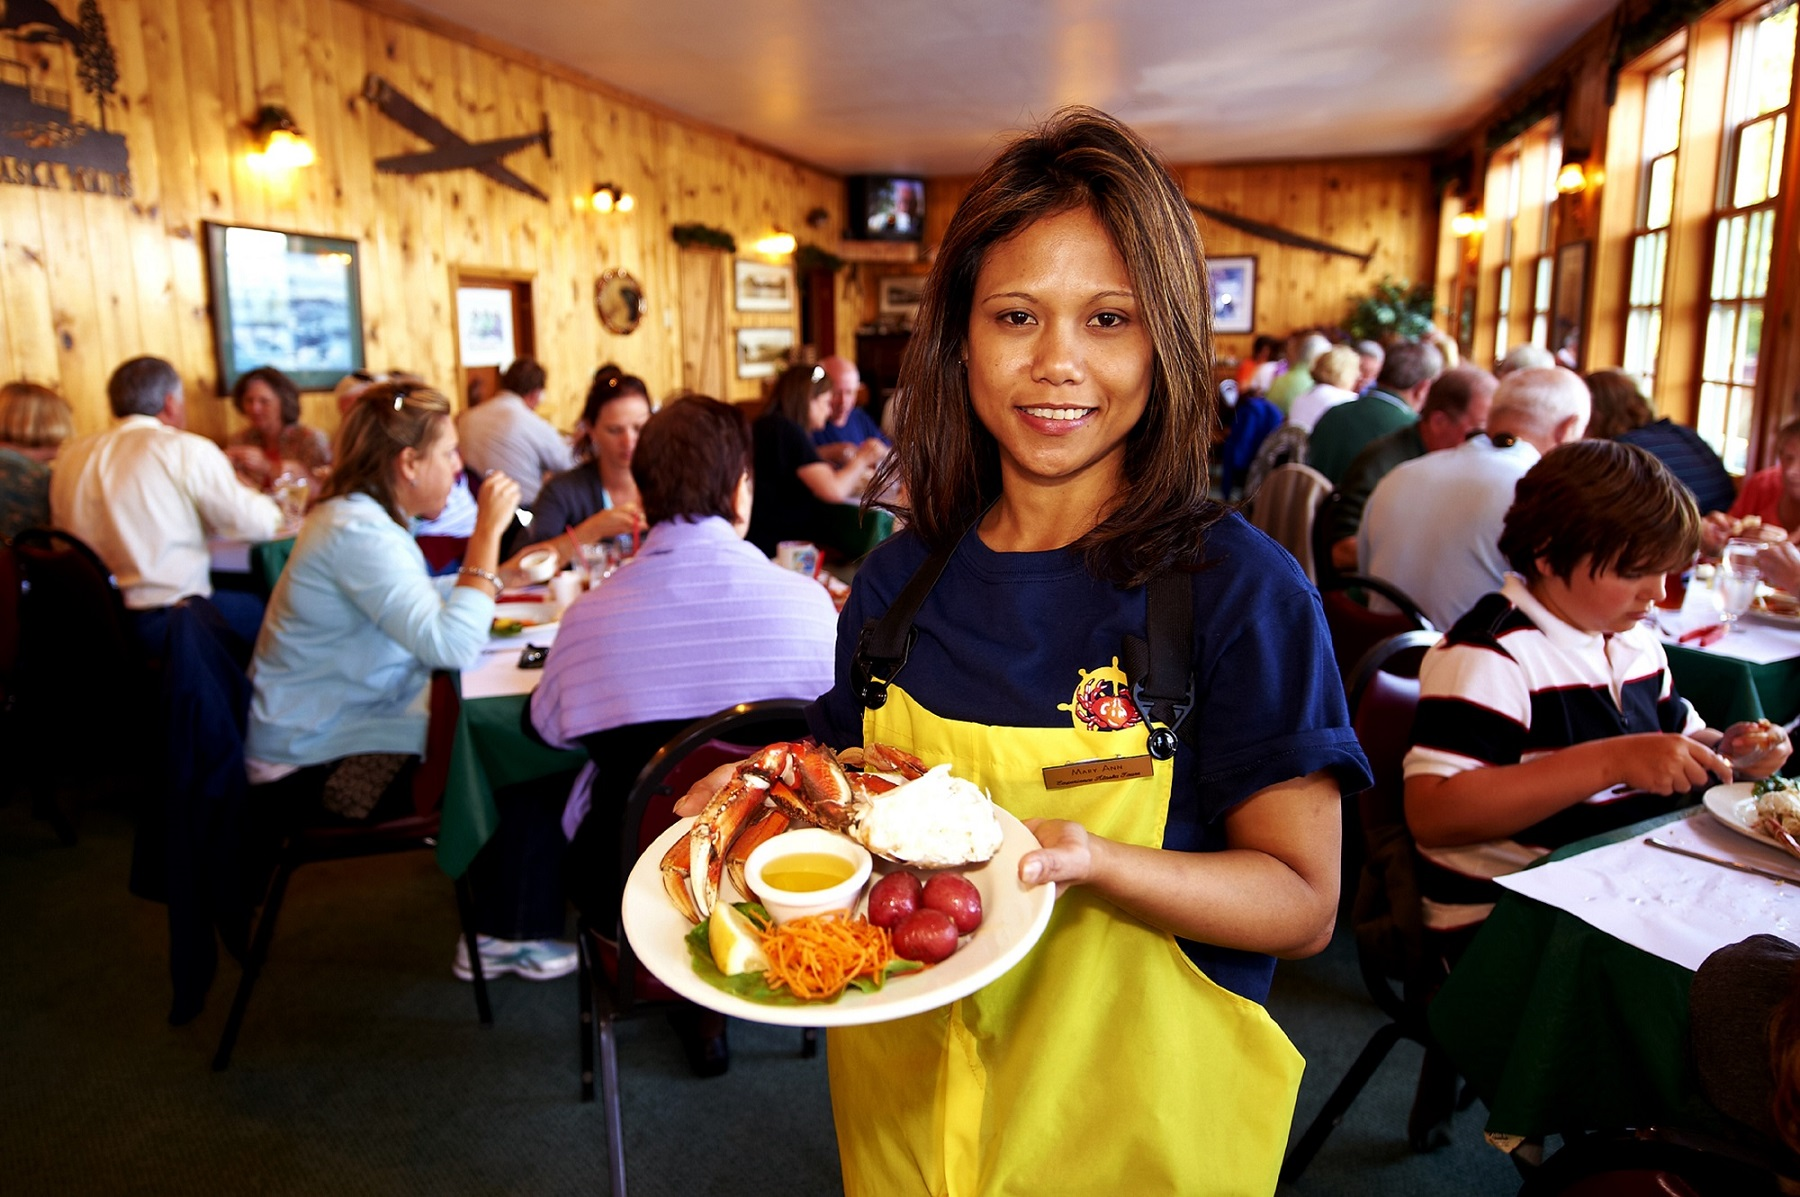 https://taquanair.com/wp-content/uploads/2020/02/Rainforest-Sanctuary-Crab-Feast-Ready-to-Eat.jpg